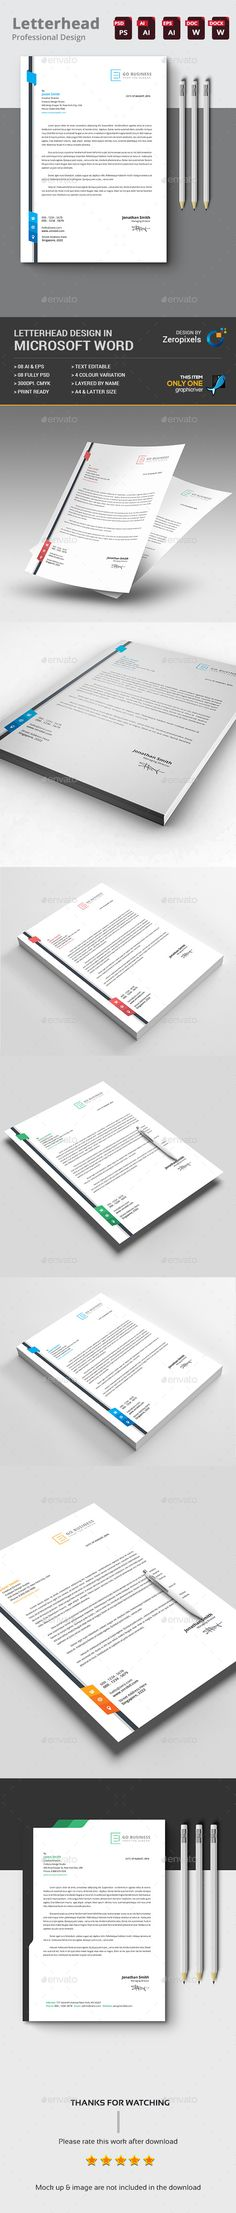 letterhead business letter format envelope sample psd template - free word letterhead template